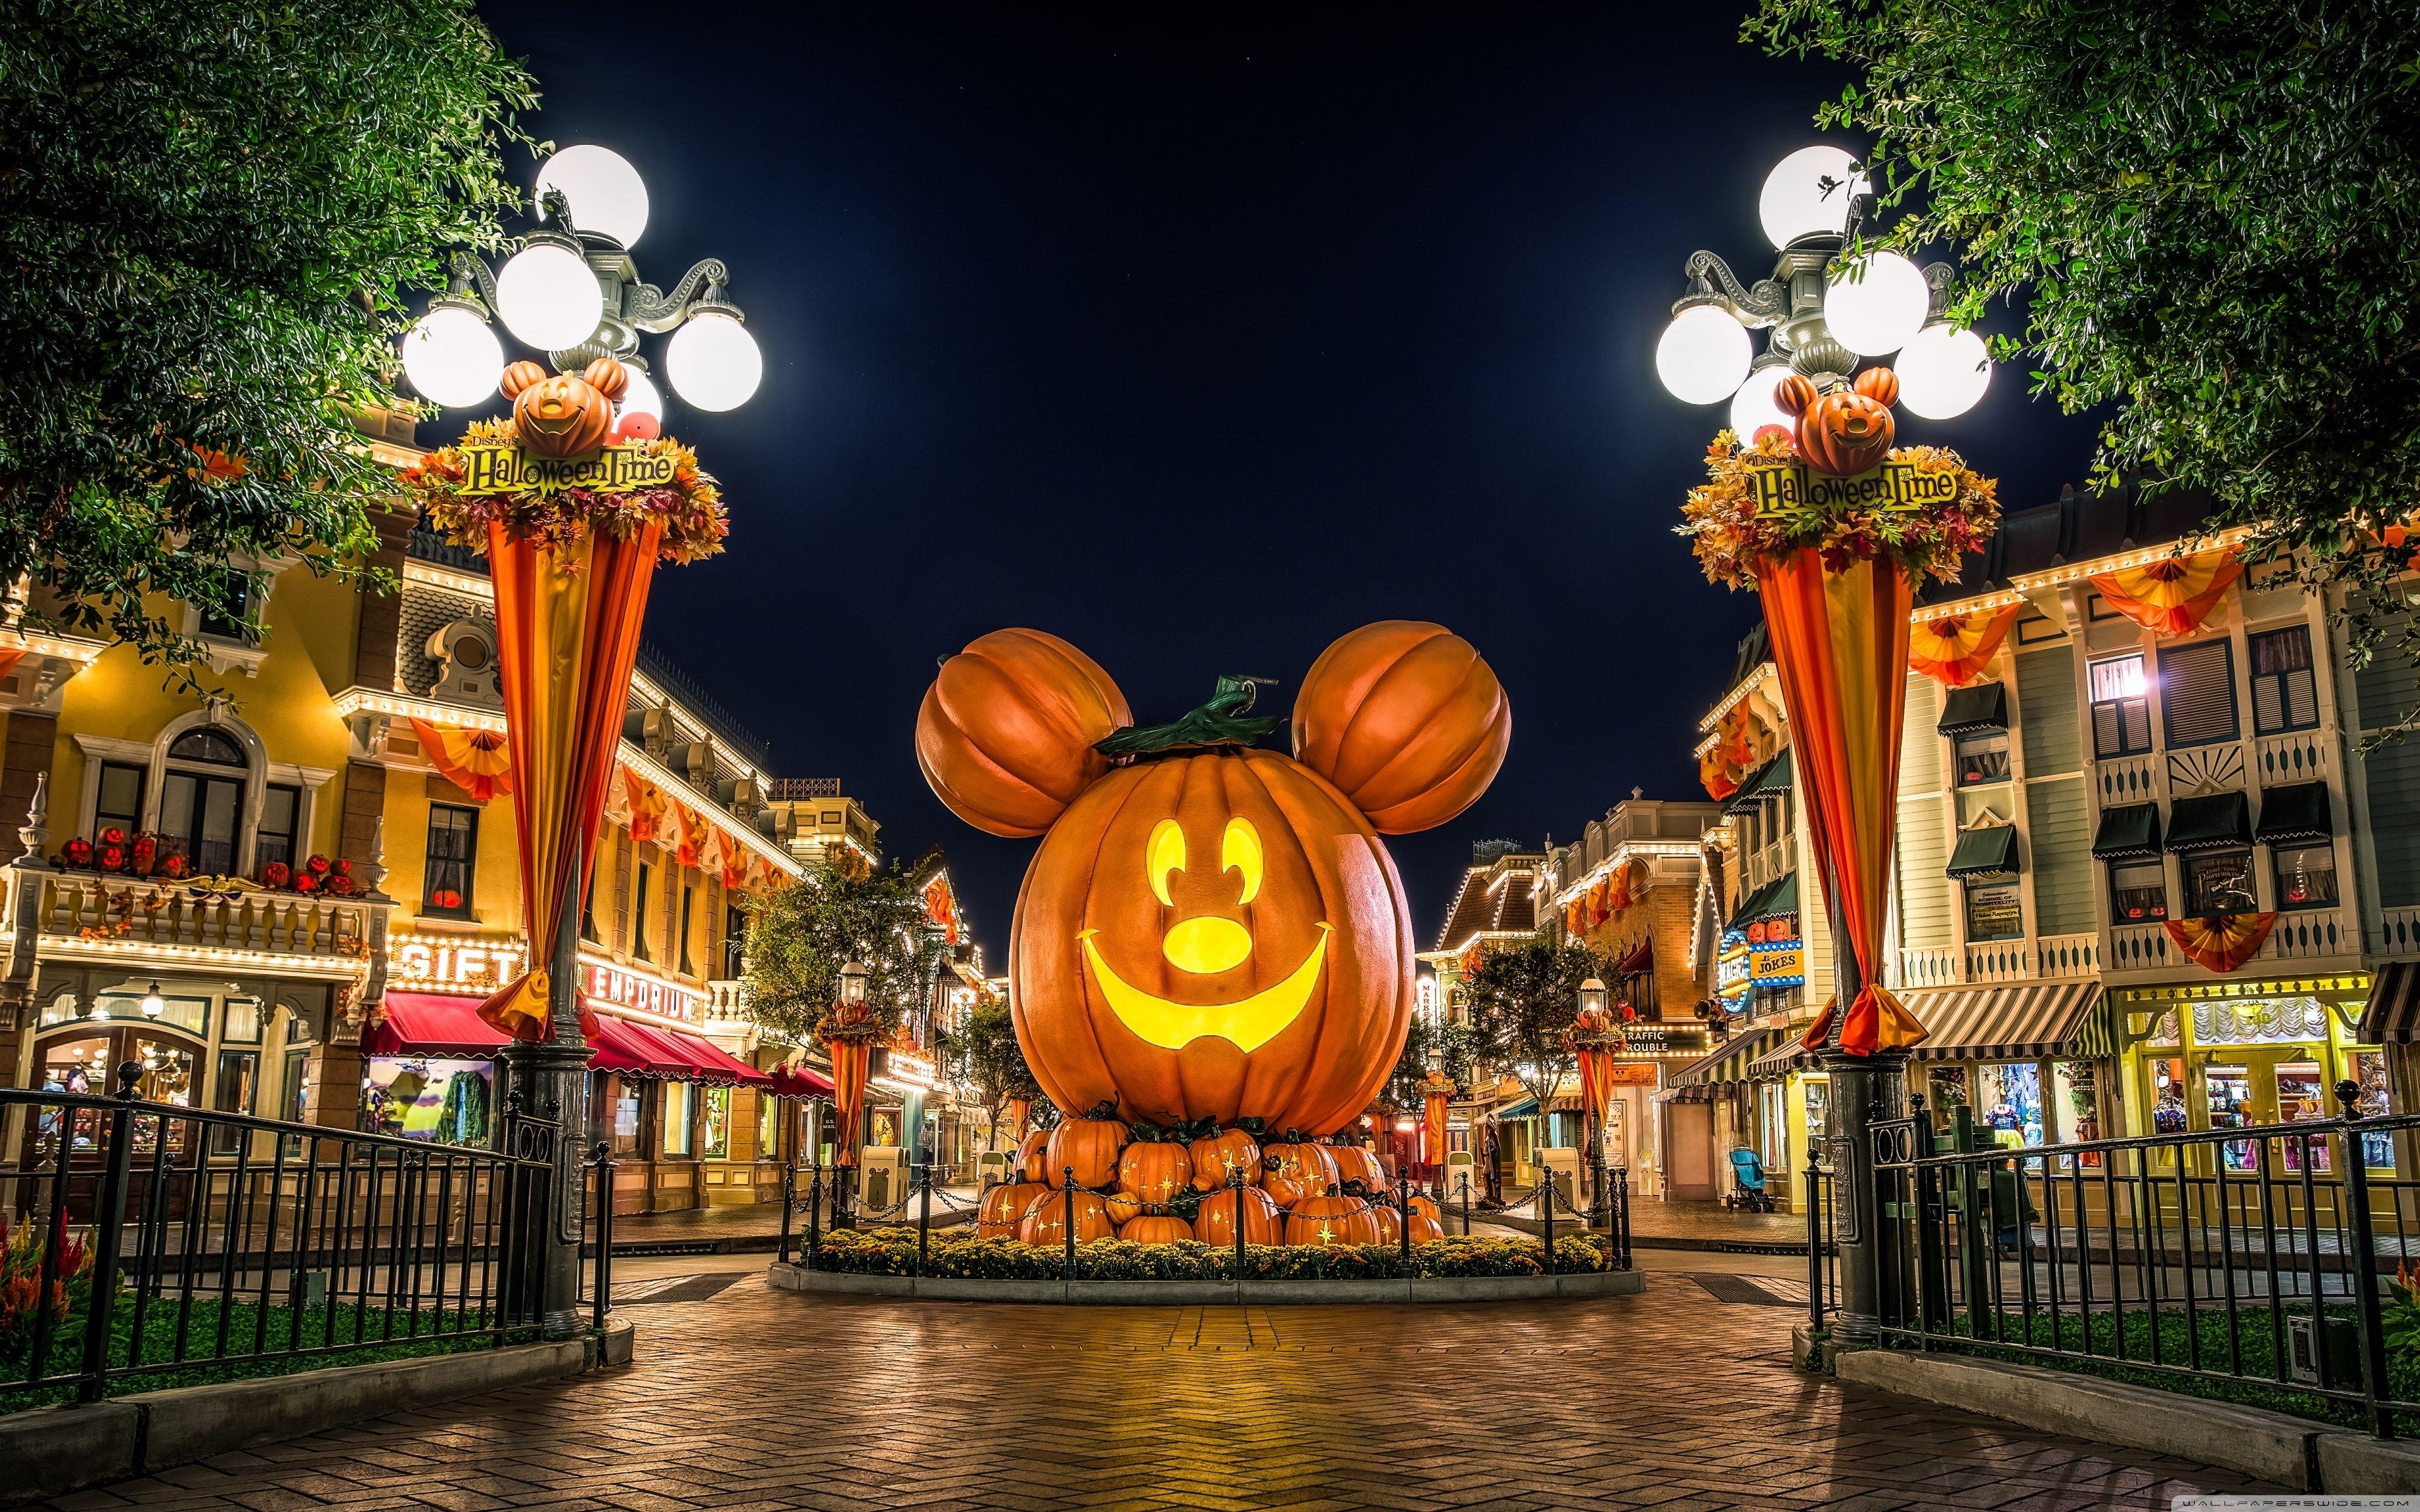 10 Latest Disney World Halloween Desktop Background Full Hd 1080p For Pc Des Halloween Desktop Wallpaper Disney World Halloween Halloween Wallpaper Backgrounds